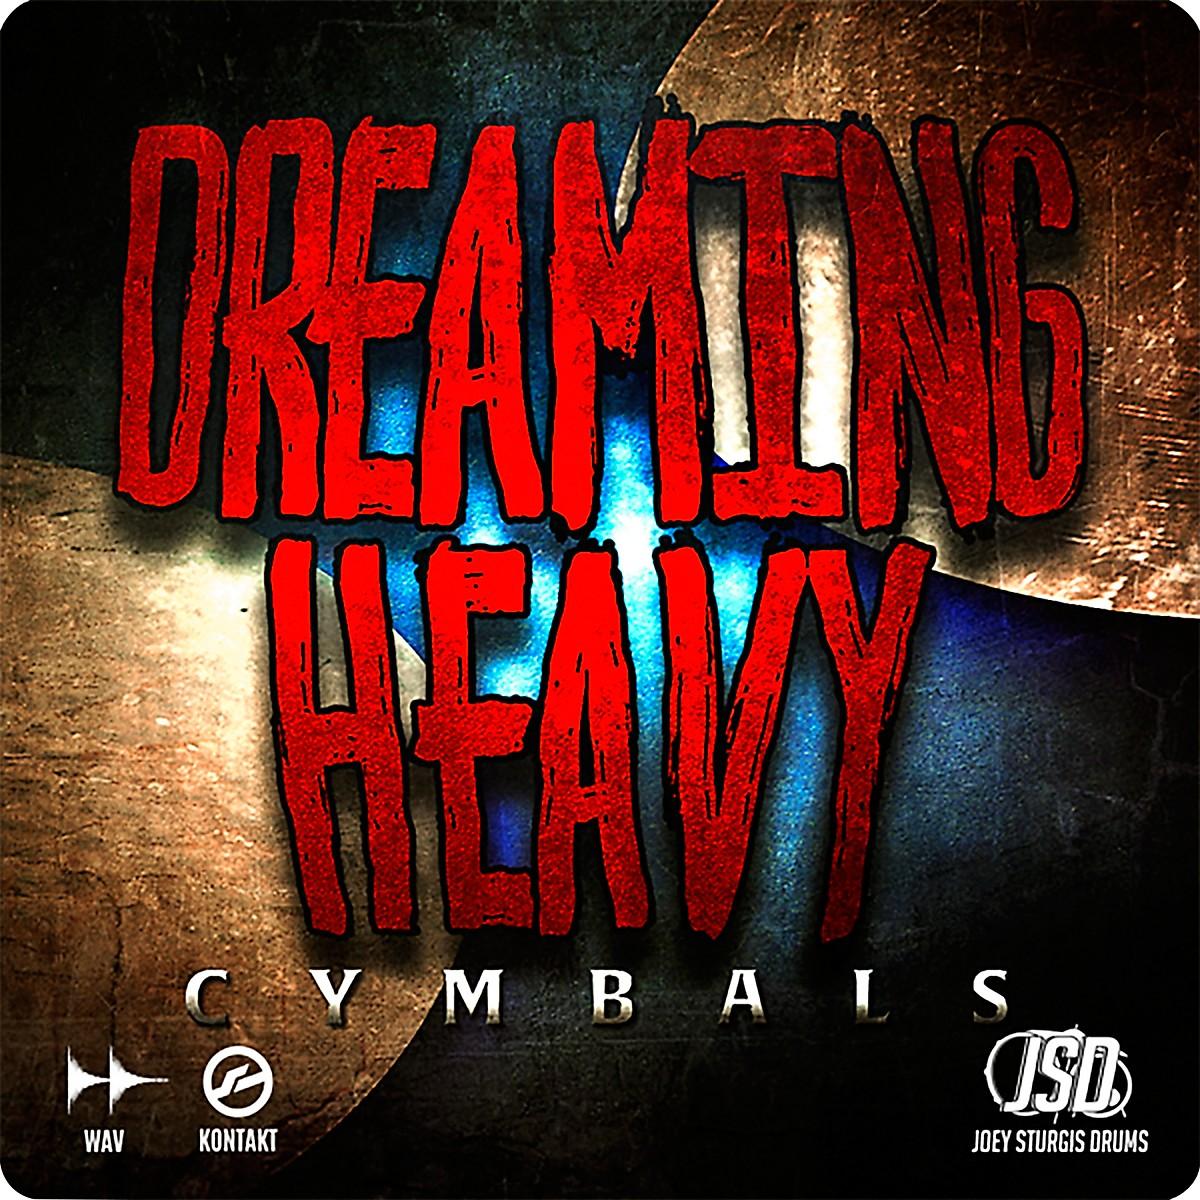 Joey Sturgis Drums Dreaming Heavy Cymbal Sample Pack